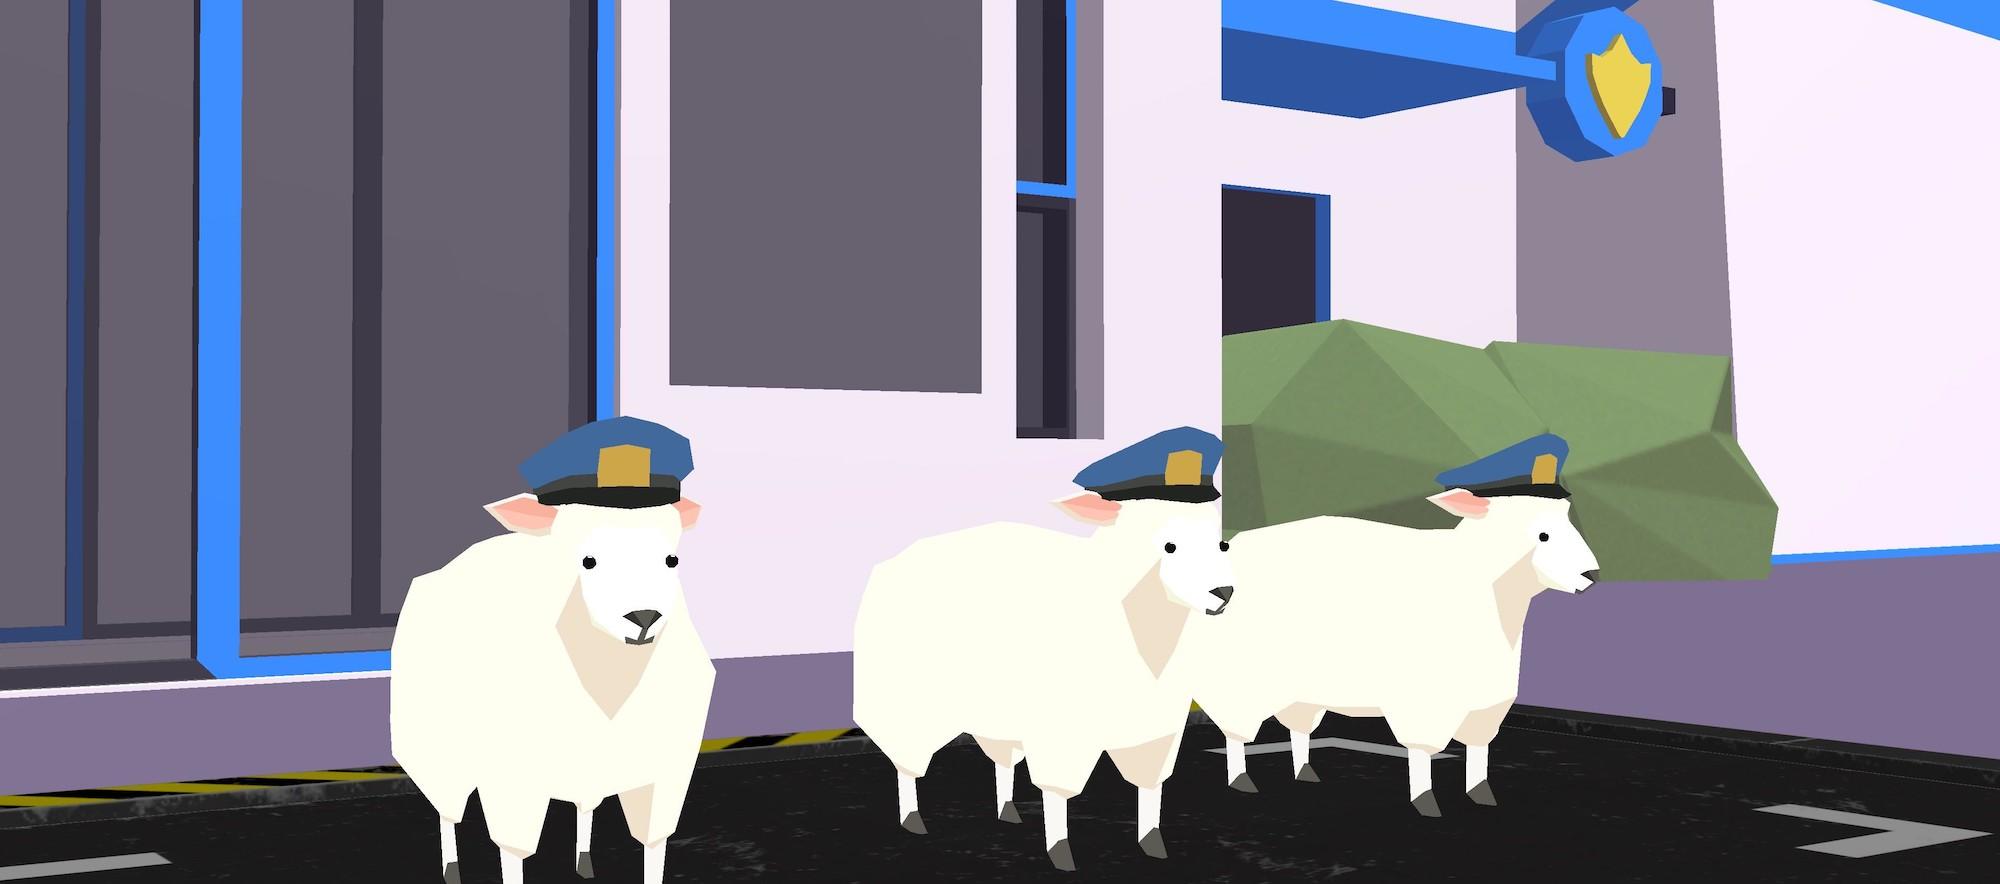 Deeeer Simulator Sheep Police